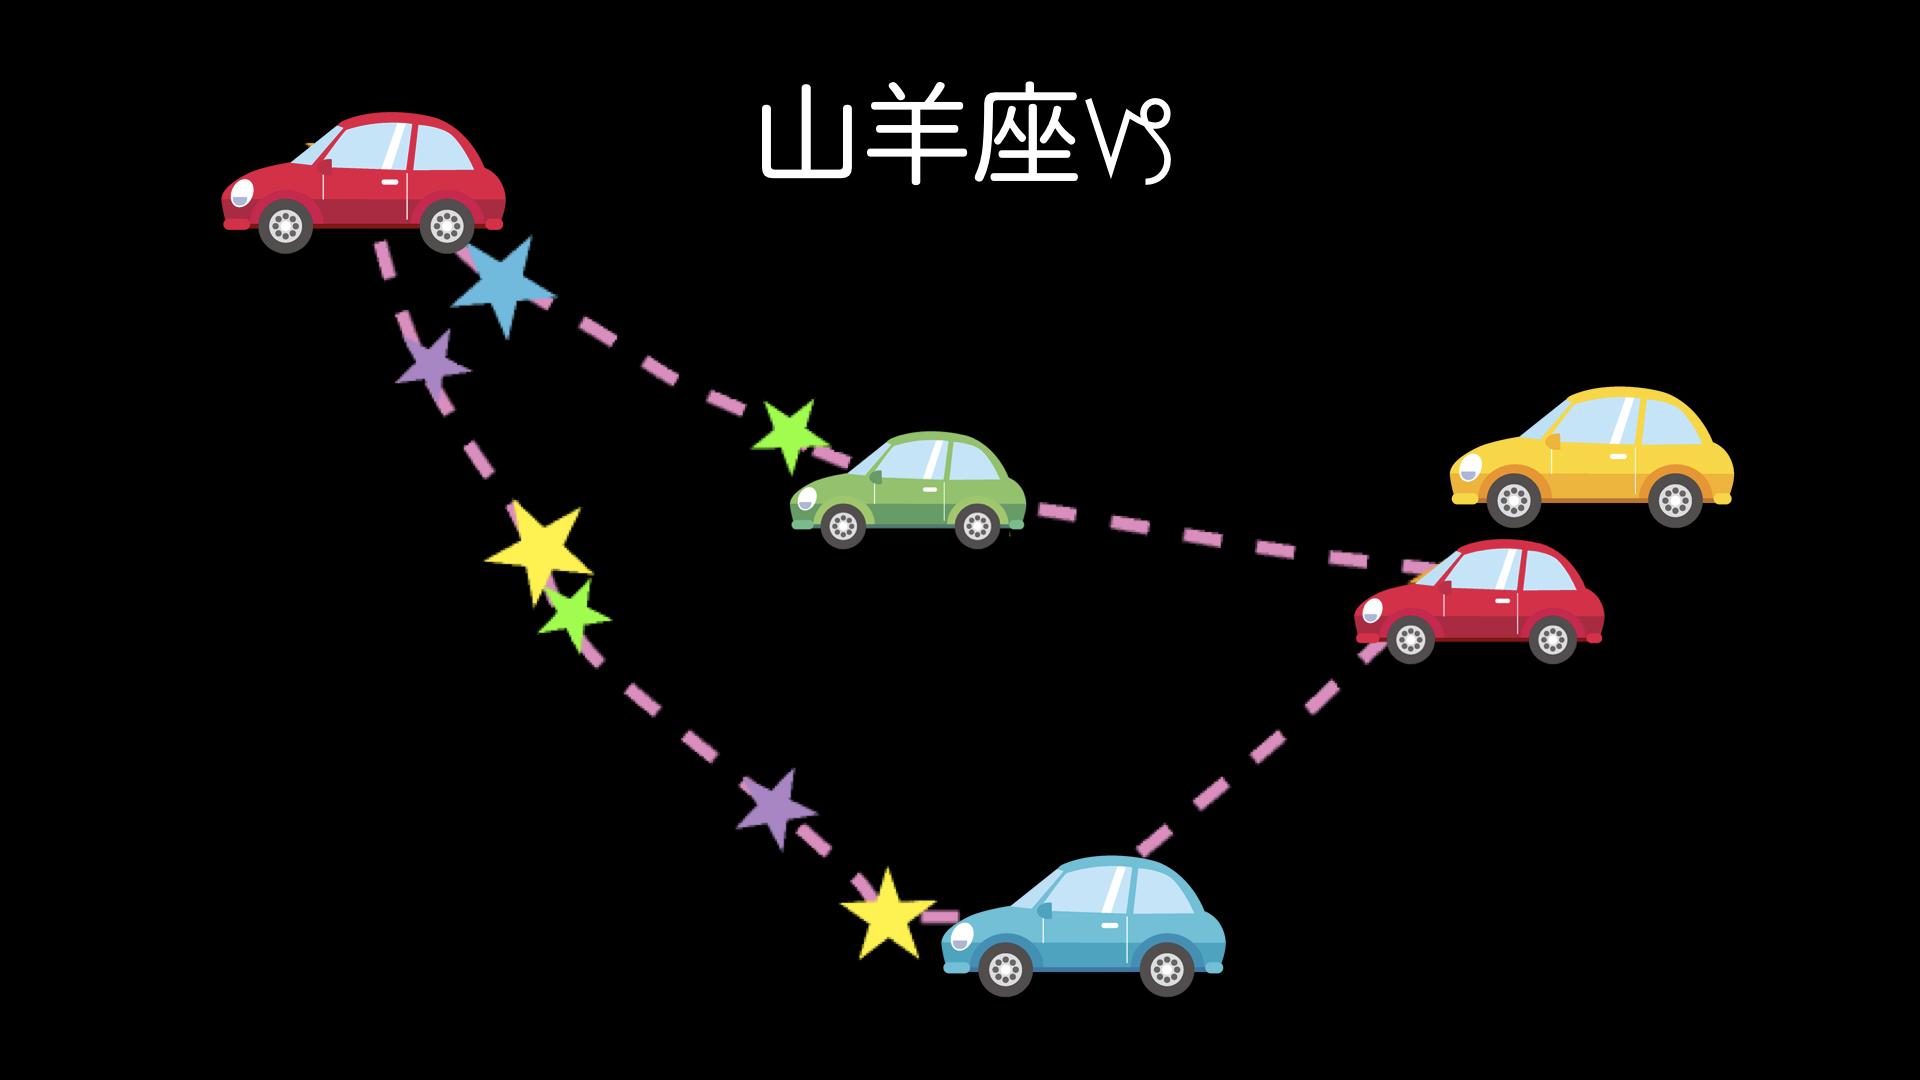 【CarMeで12星座占い】今週のあなたの運勢は?ー9月3日~9月9日